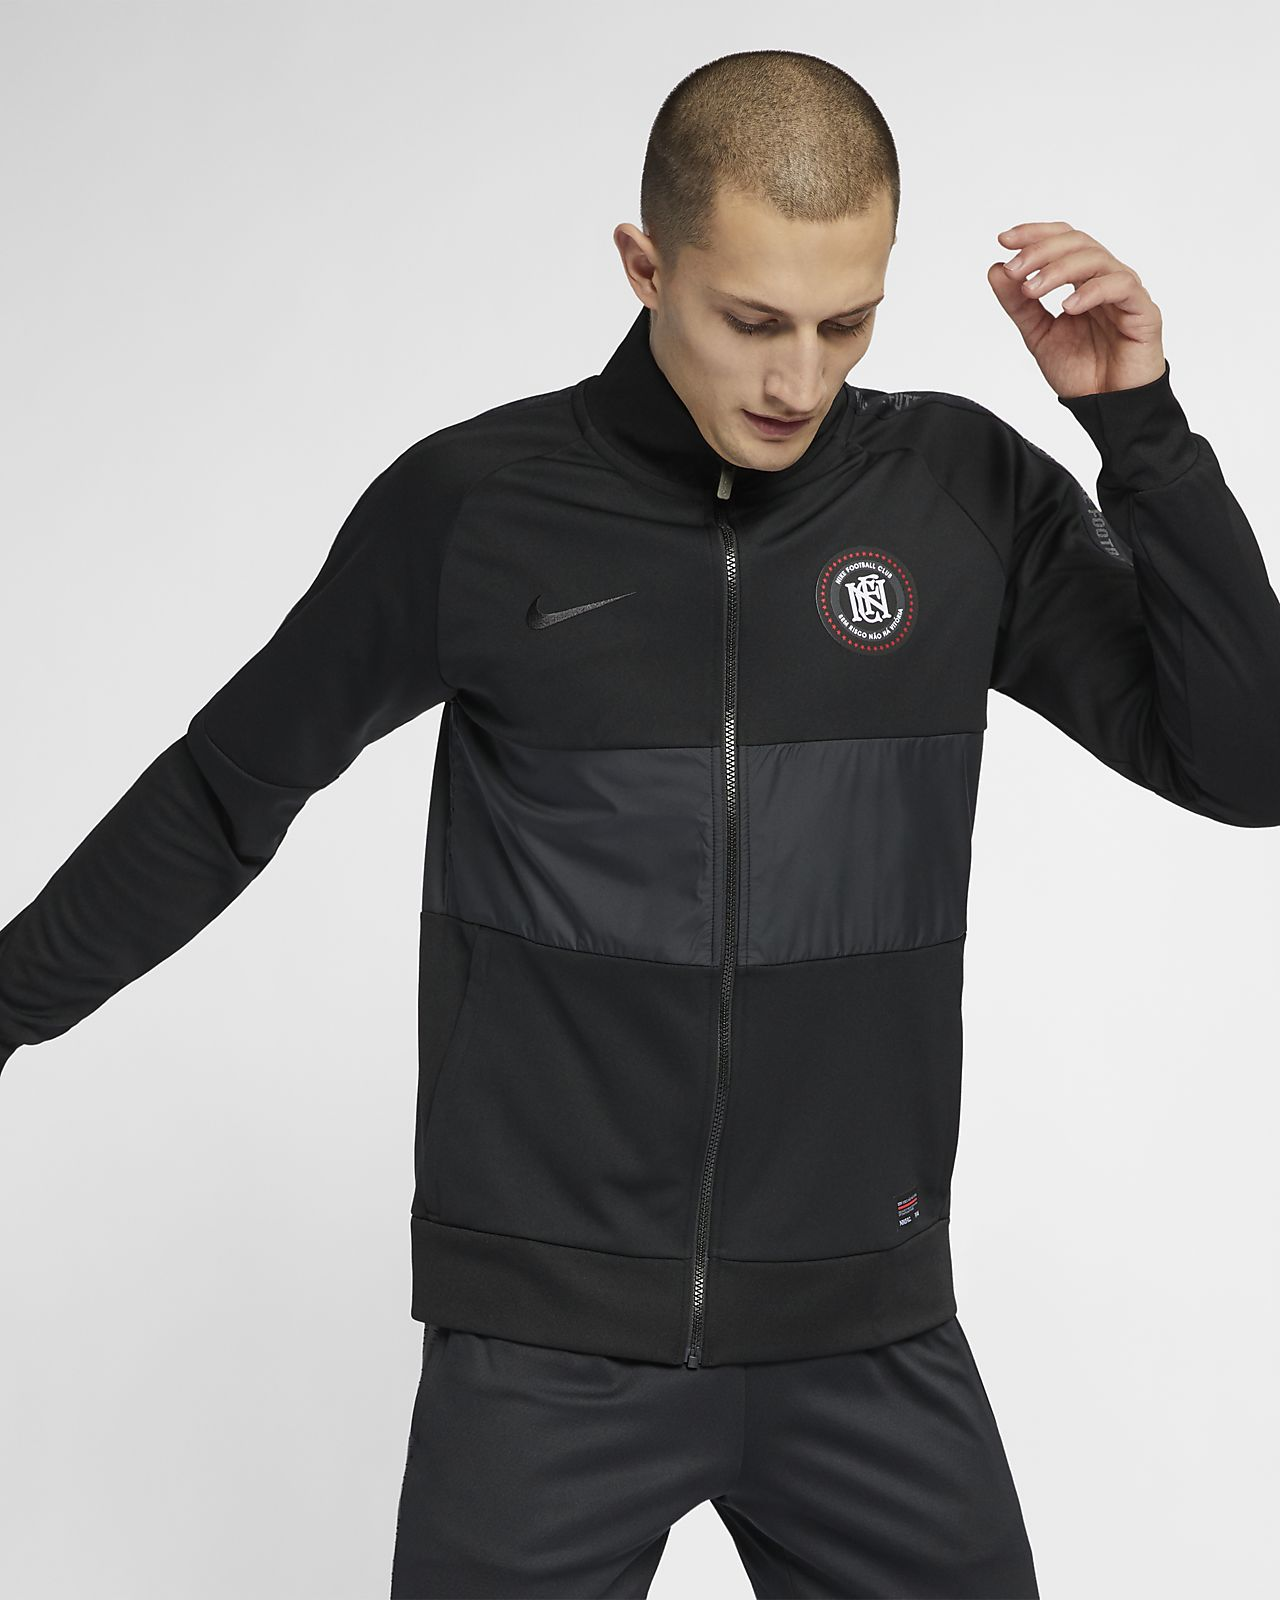 df1768daeb0b Nike F.C. Men s Football Track Jacket. Nike.com CA